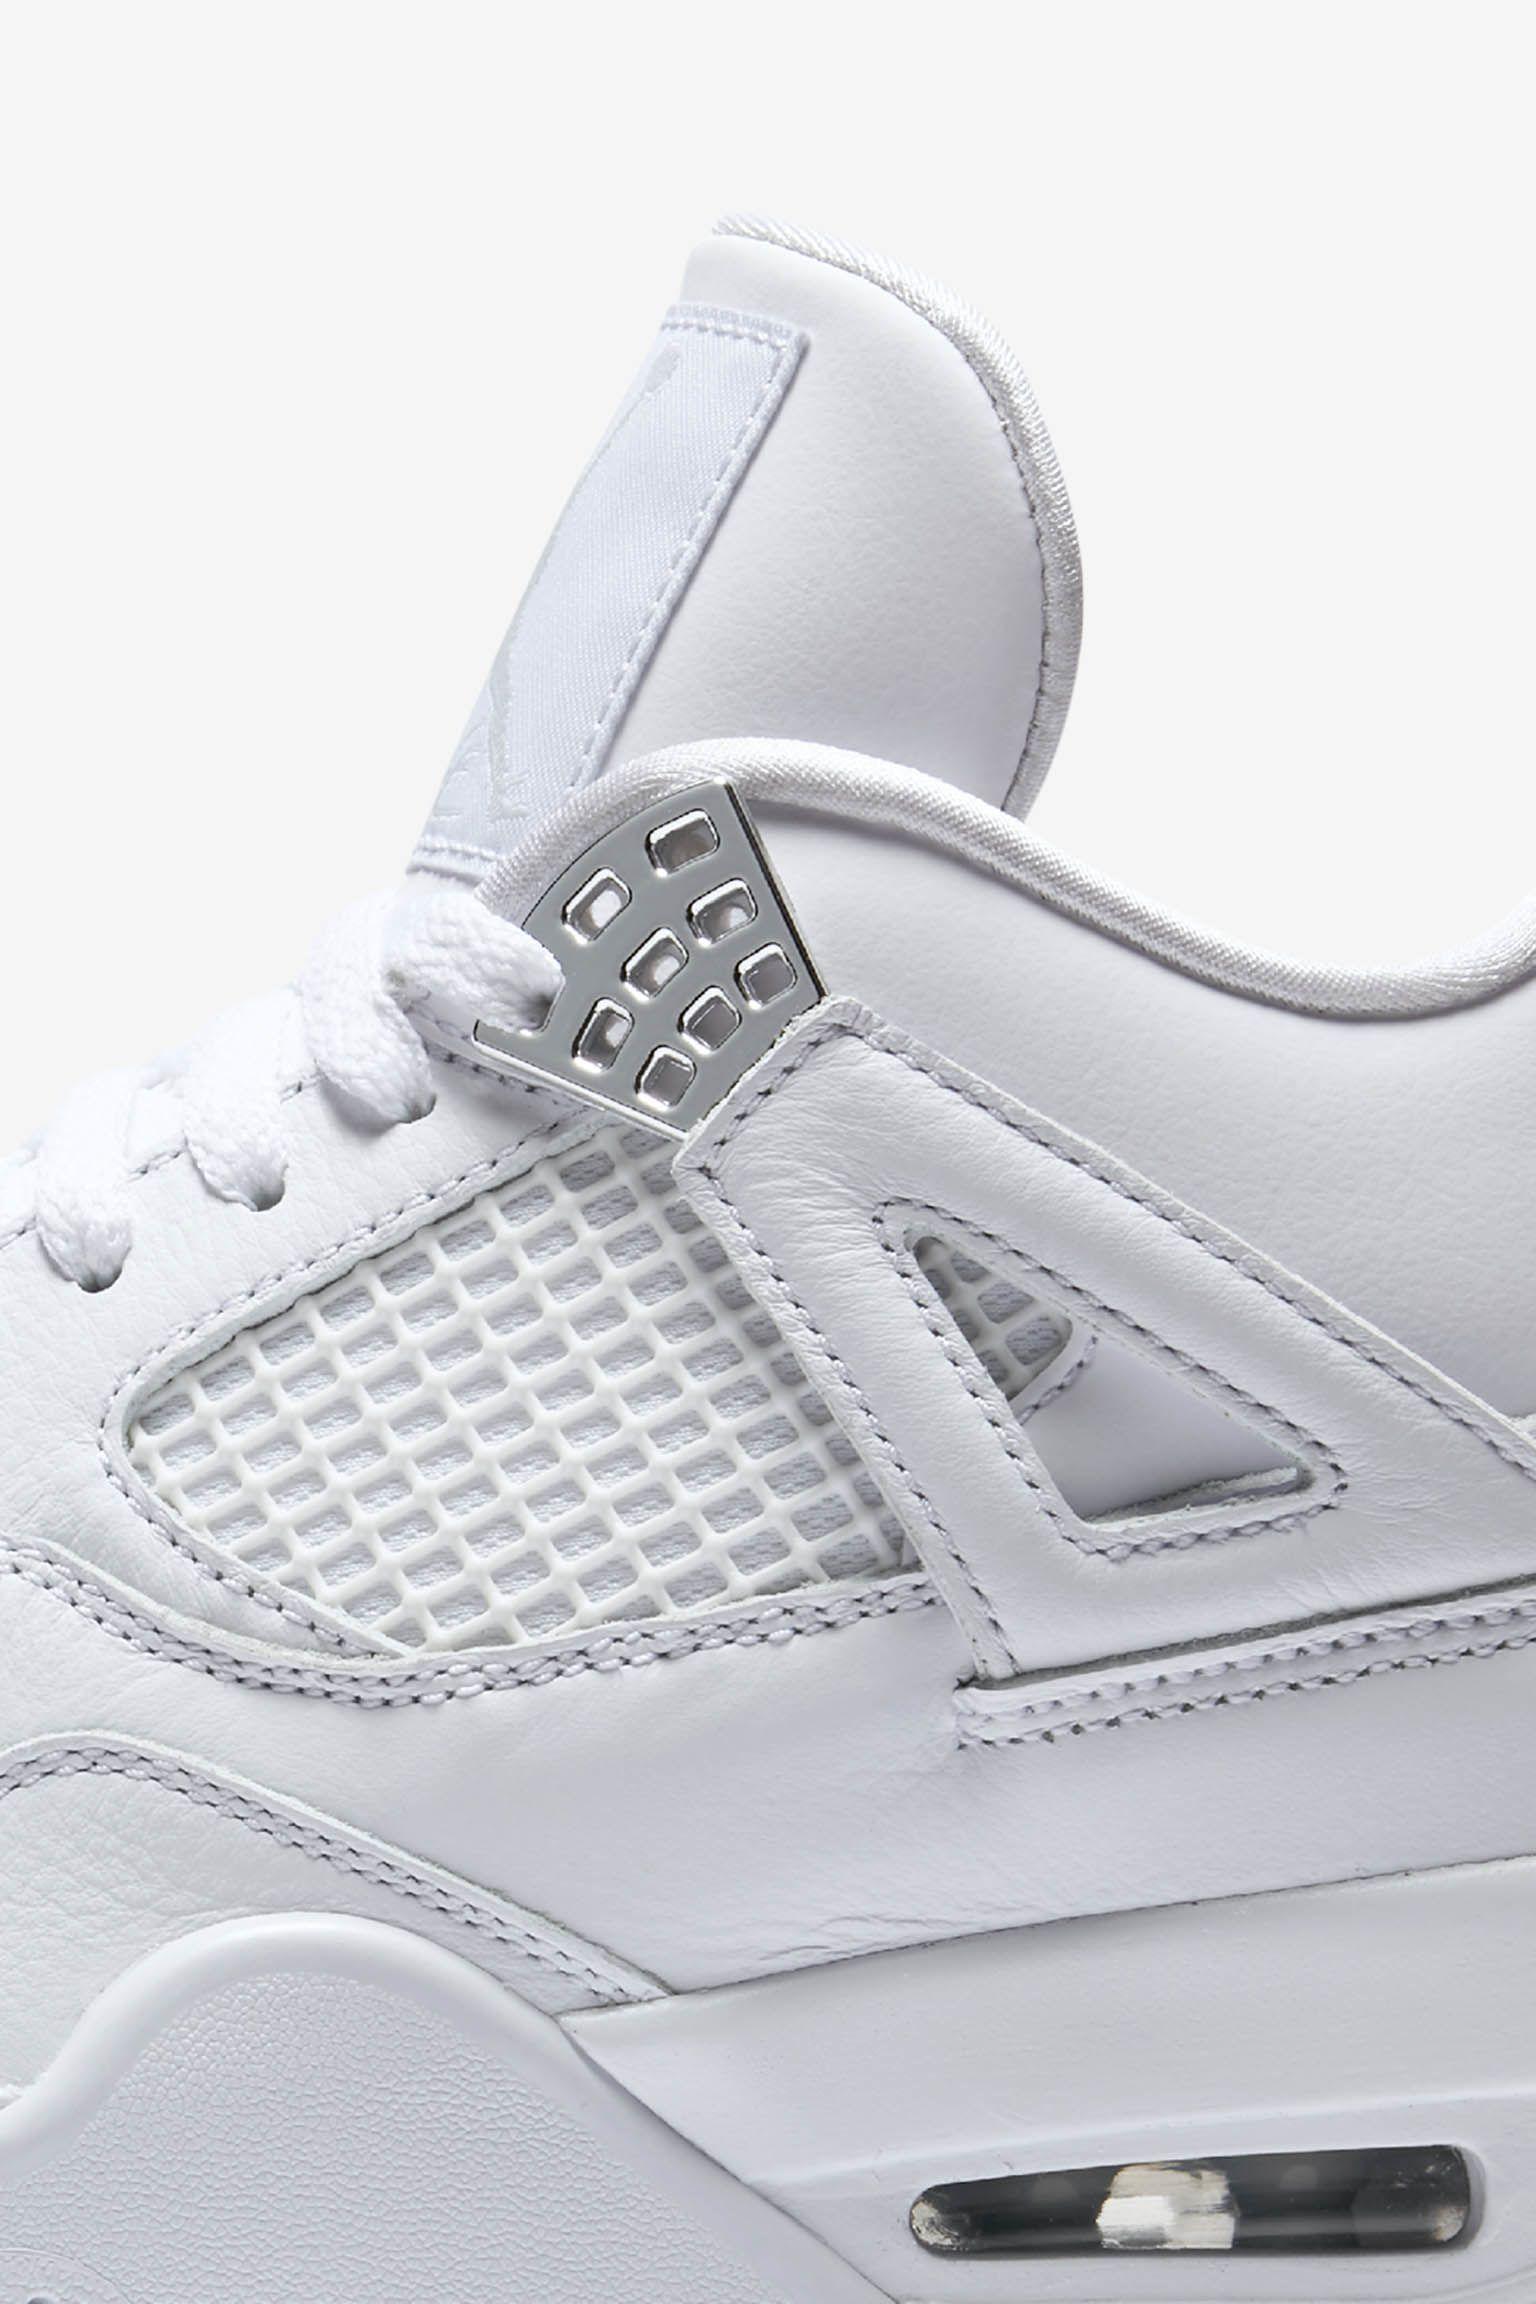 Air Jordan 4 Retro 'Pure Money' Release Date